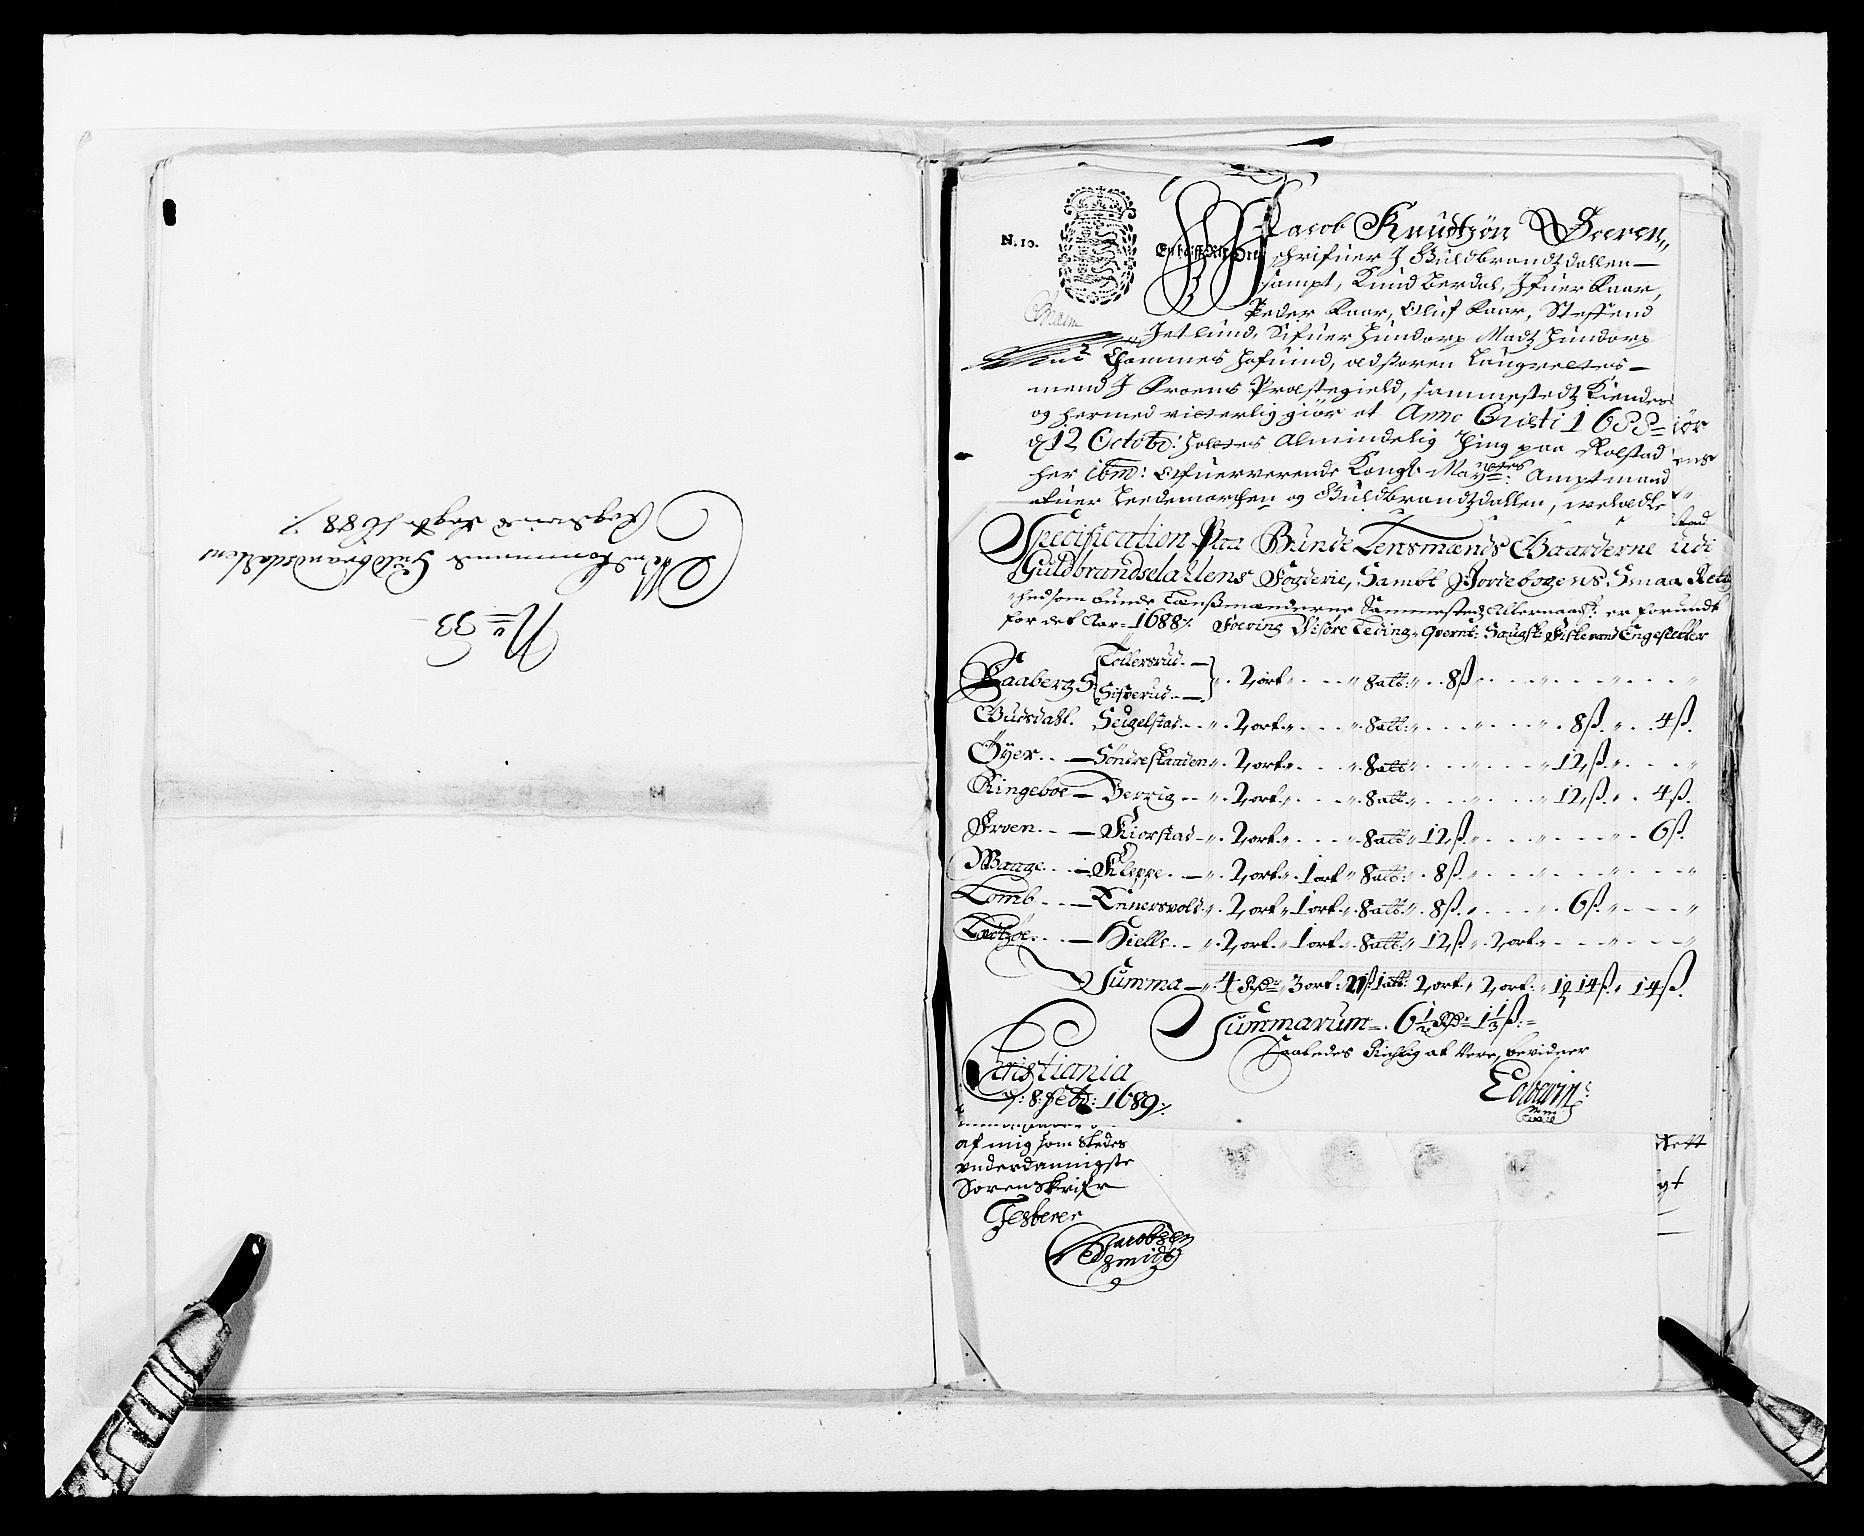 RA, Rentekammeret inntil 1814, Reviderte regnskaper, Fogderegnskap, R17/L1163: Fogderegnskap Gudbrandsdal, 1682-1689, s. 336